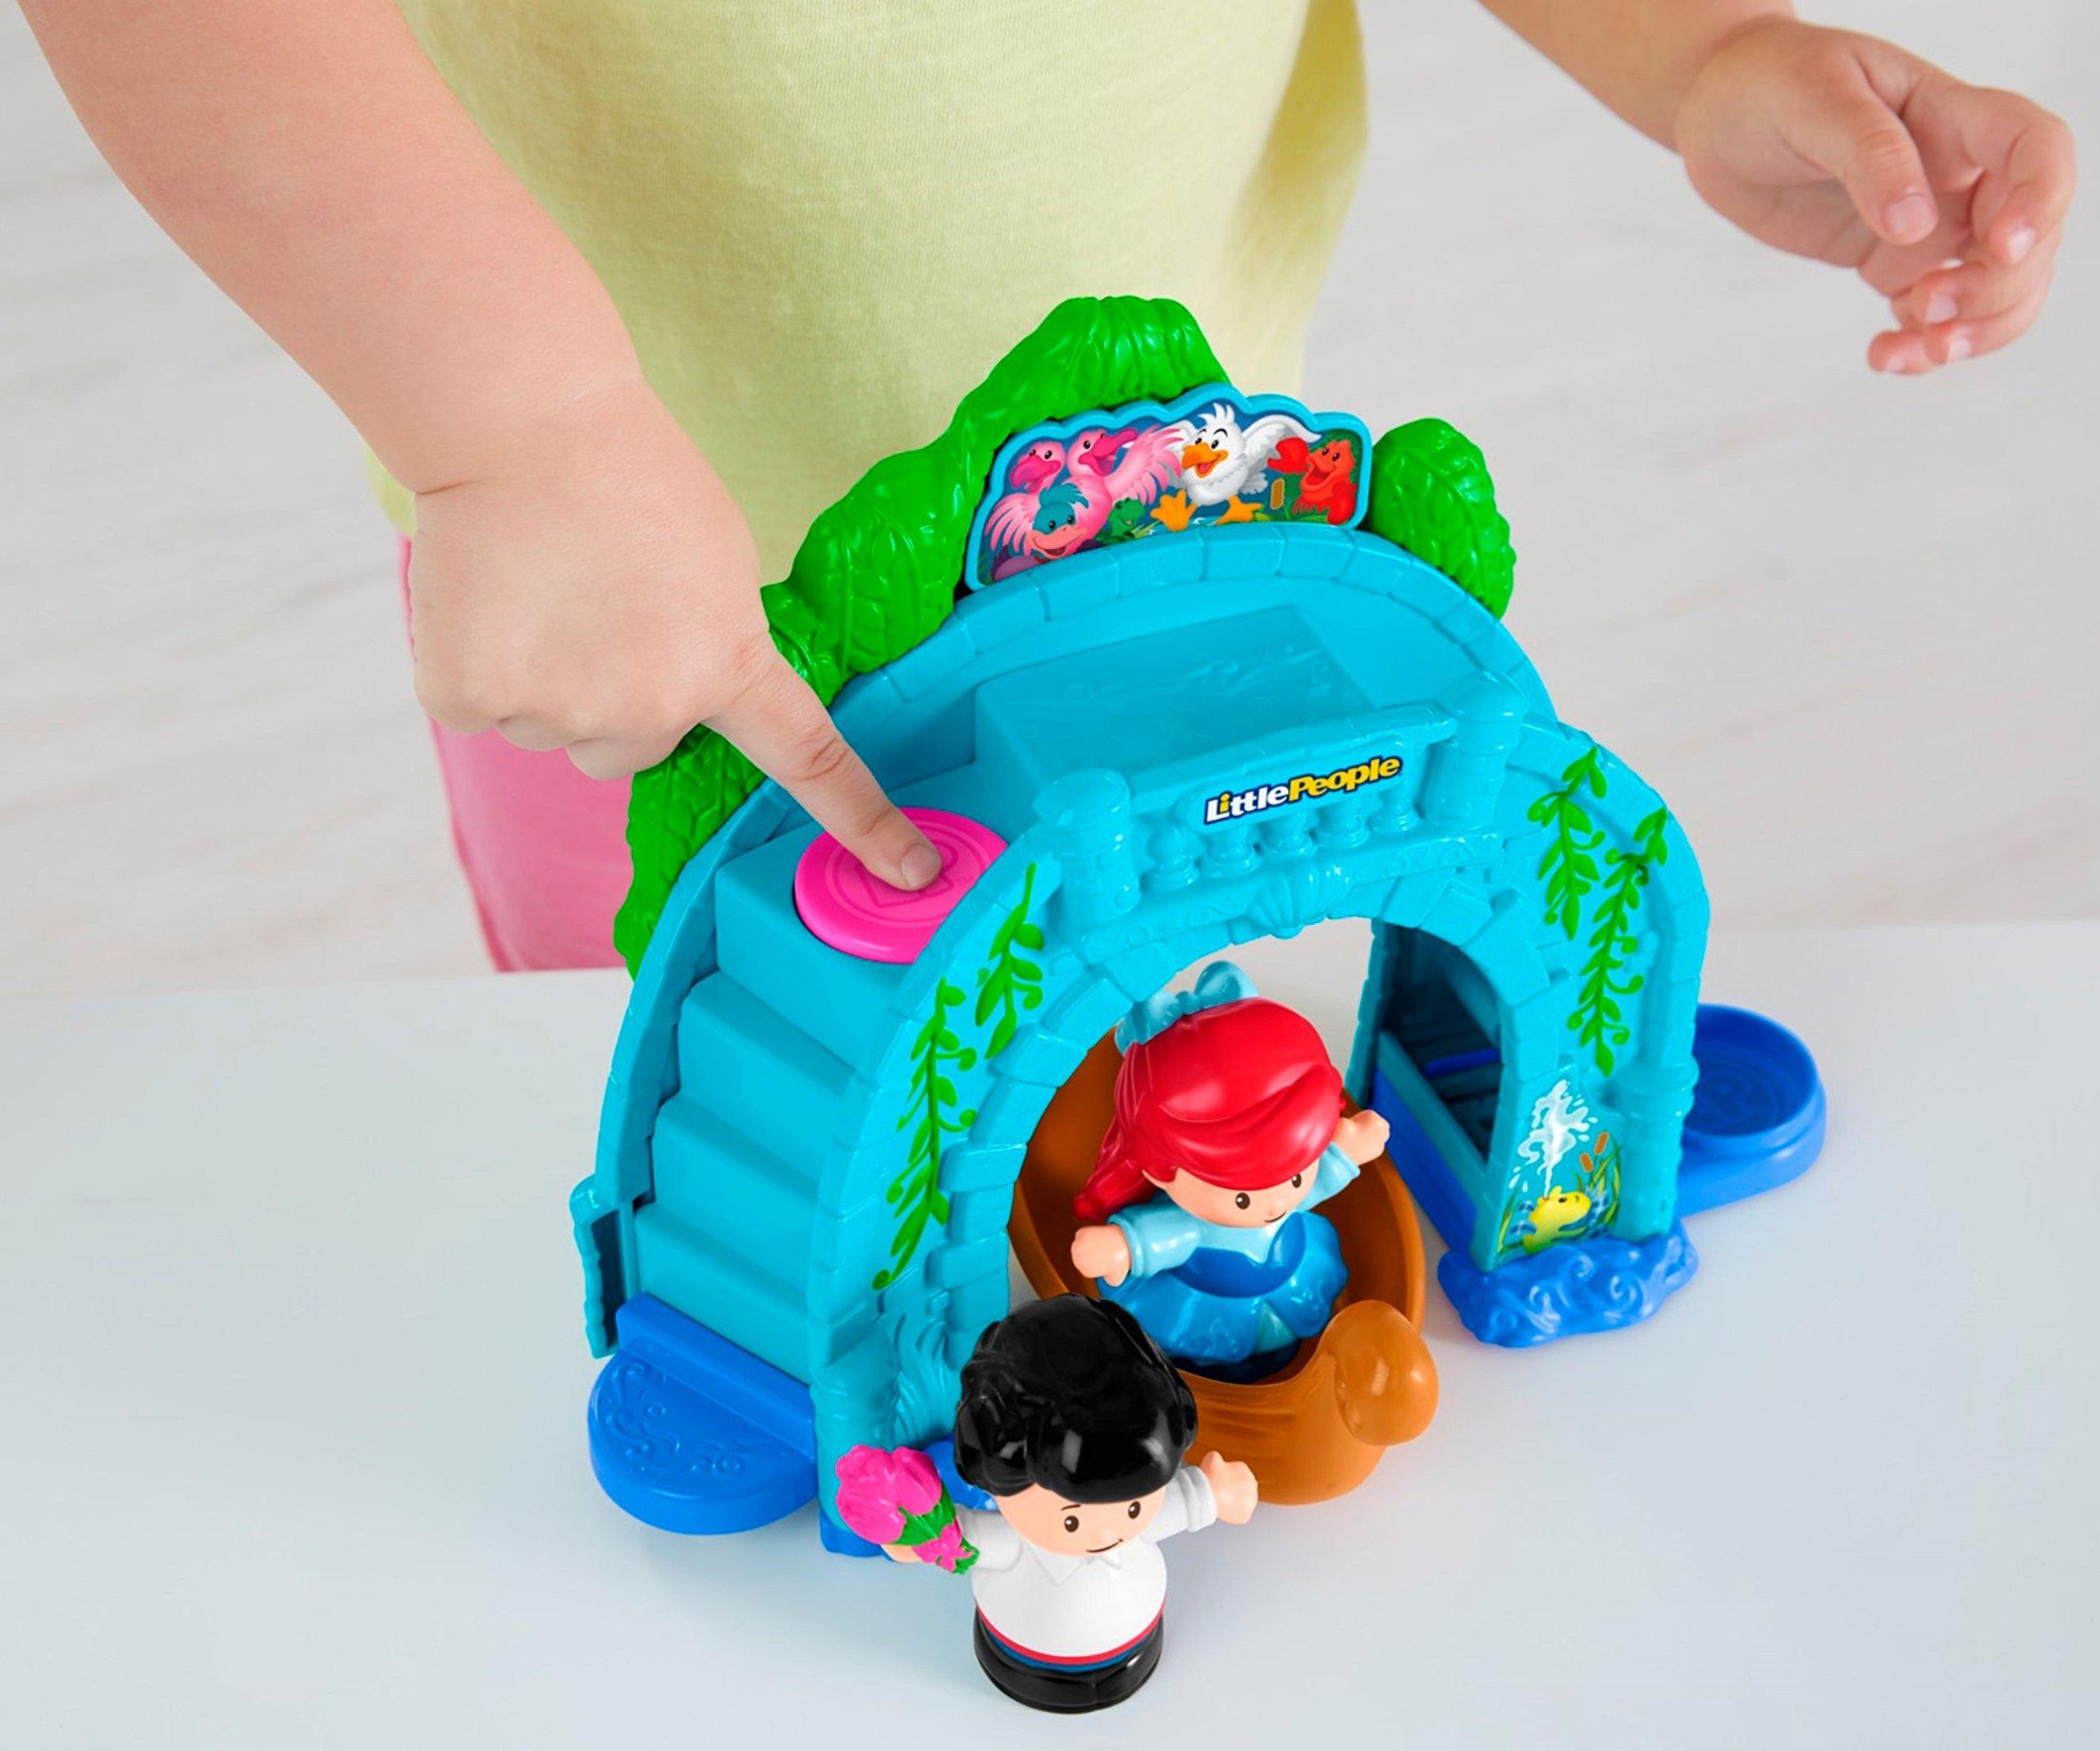 Fisher-Price Little People Disney Princess, Ariel Vehicle Playset